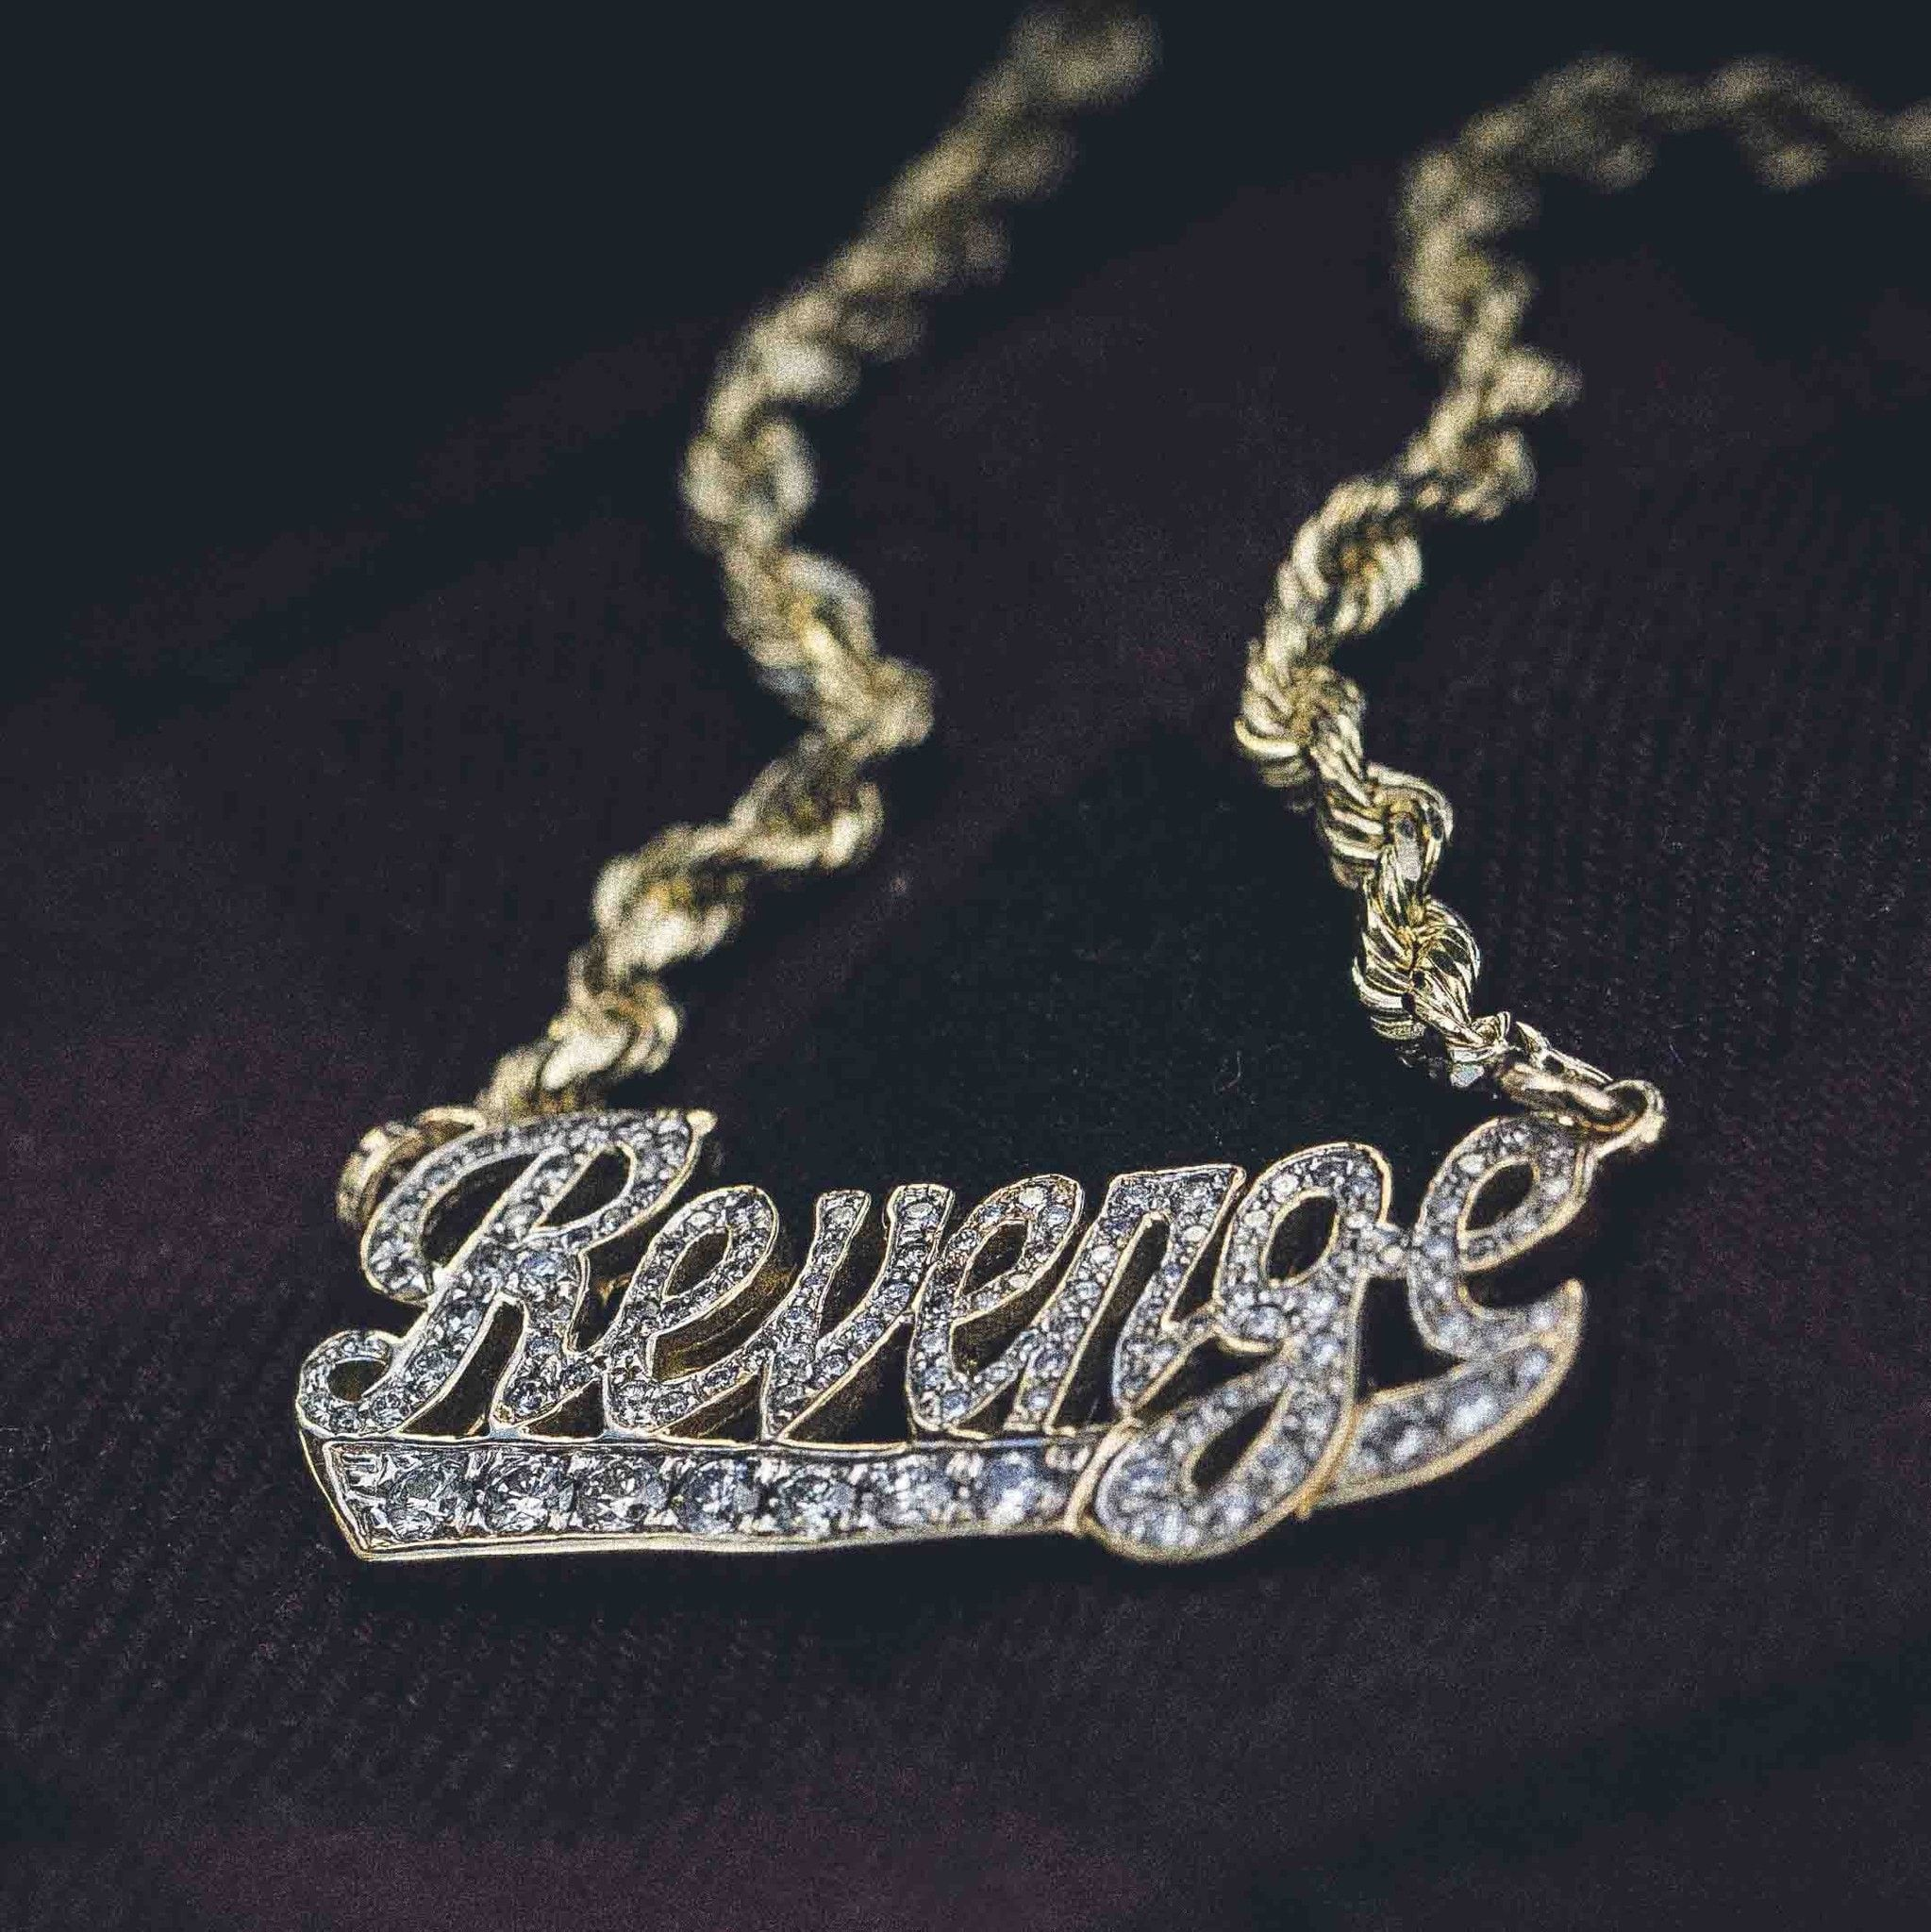 Iced revenge pendant the king of streetwear ian pinterest iced revenge pendant aloadofball Gallery